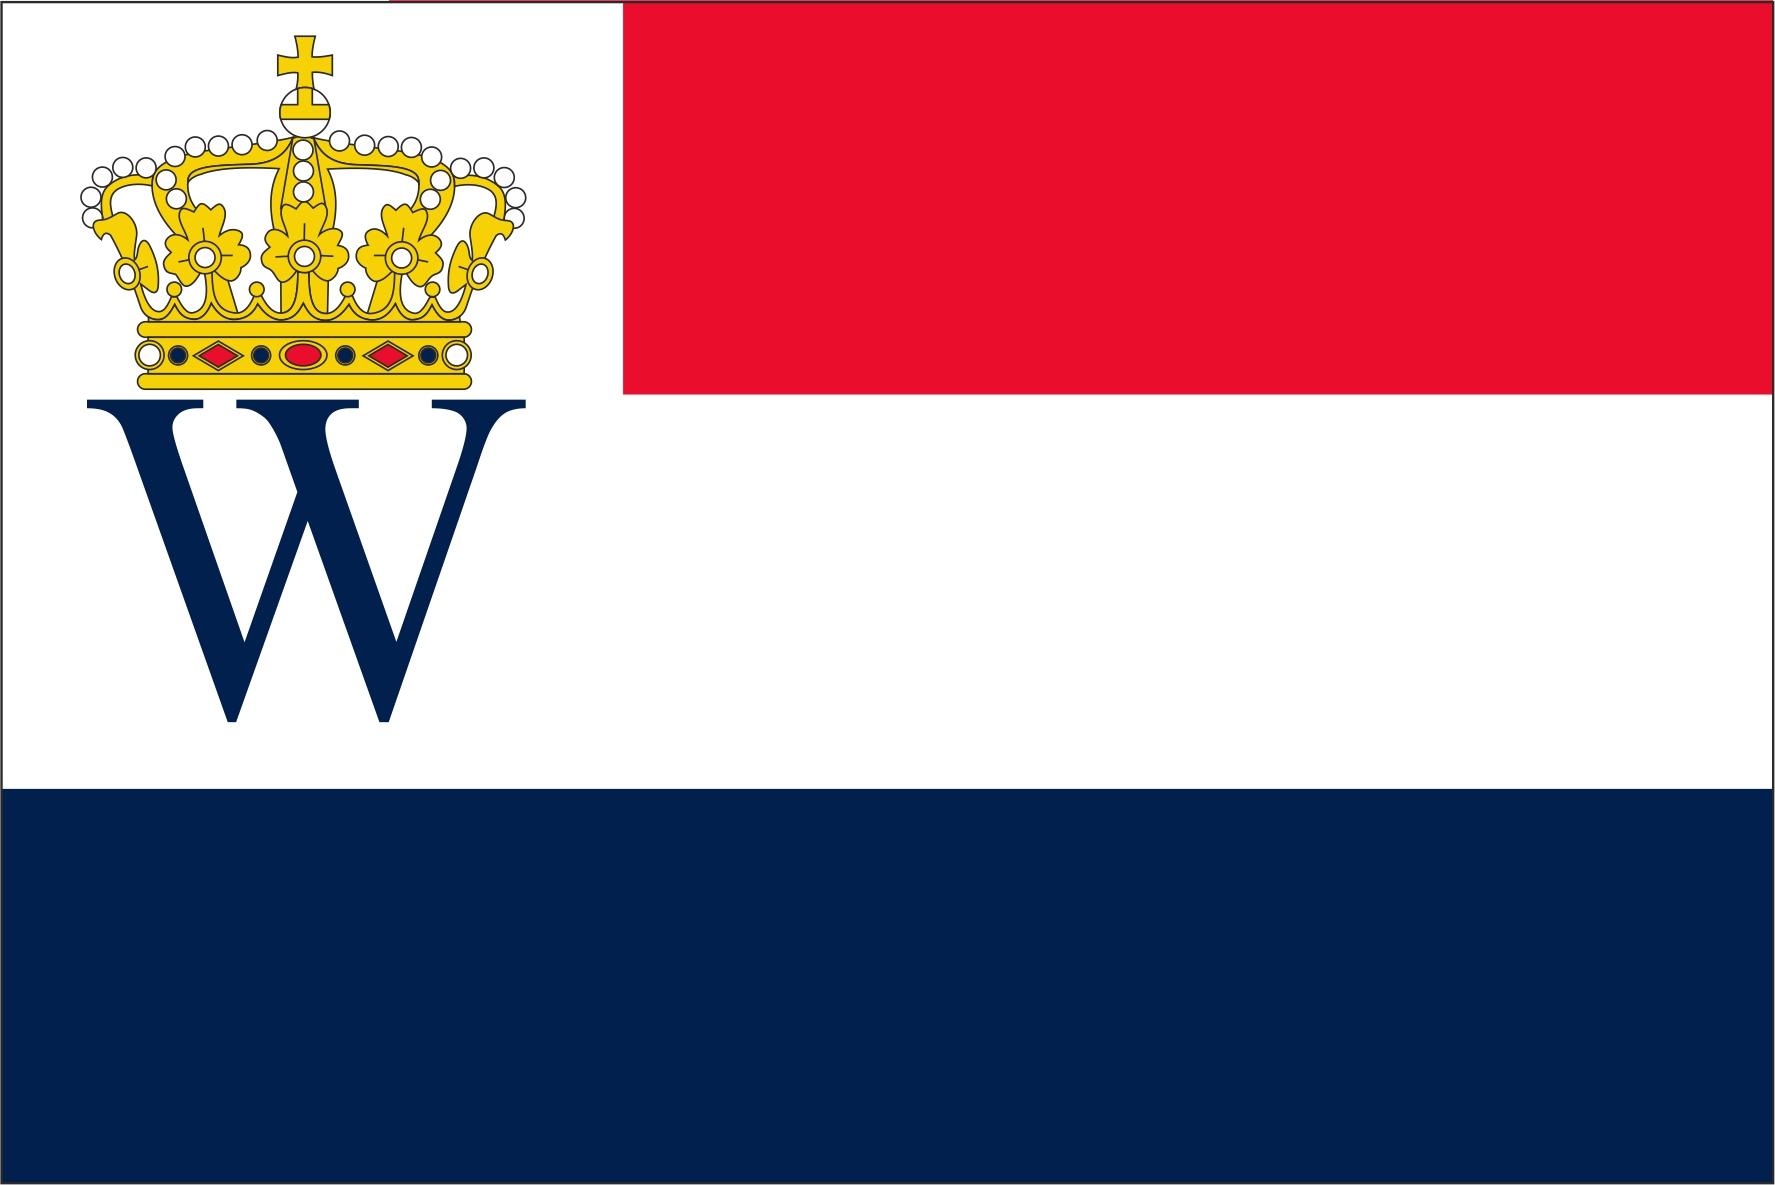 Vlaggen 200 jaar Koninkrijk der Nederlanden 120x180cm vlag Oud hollands Marineblauw